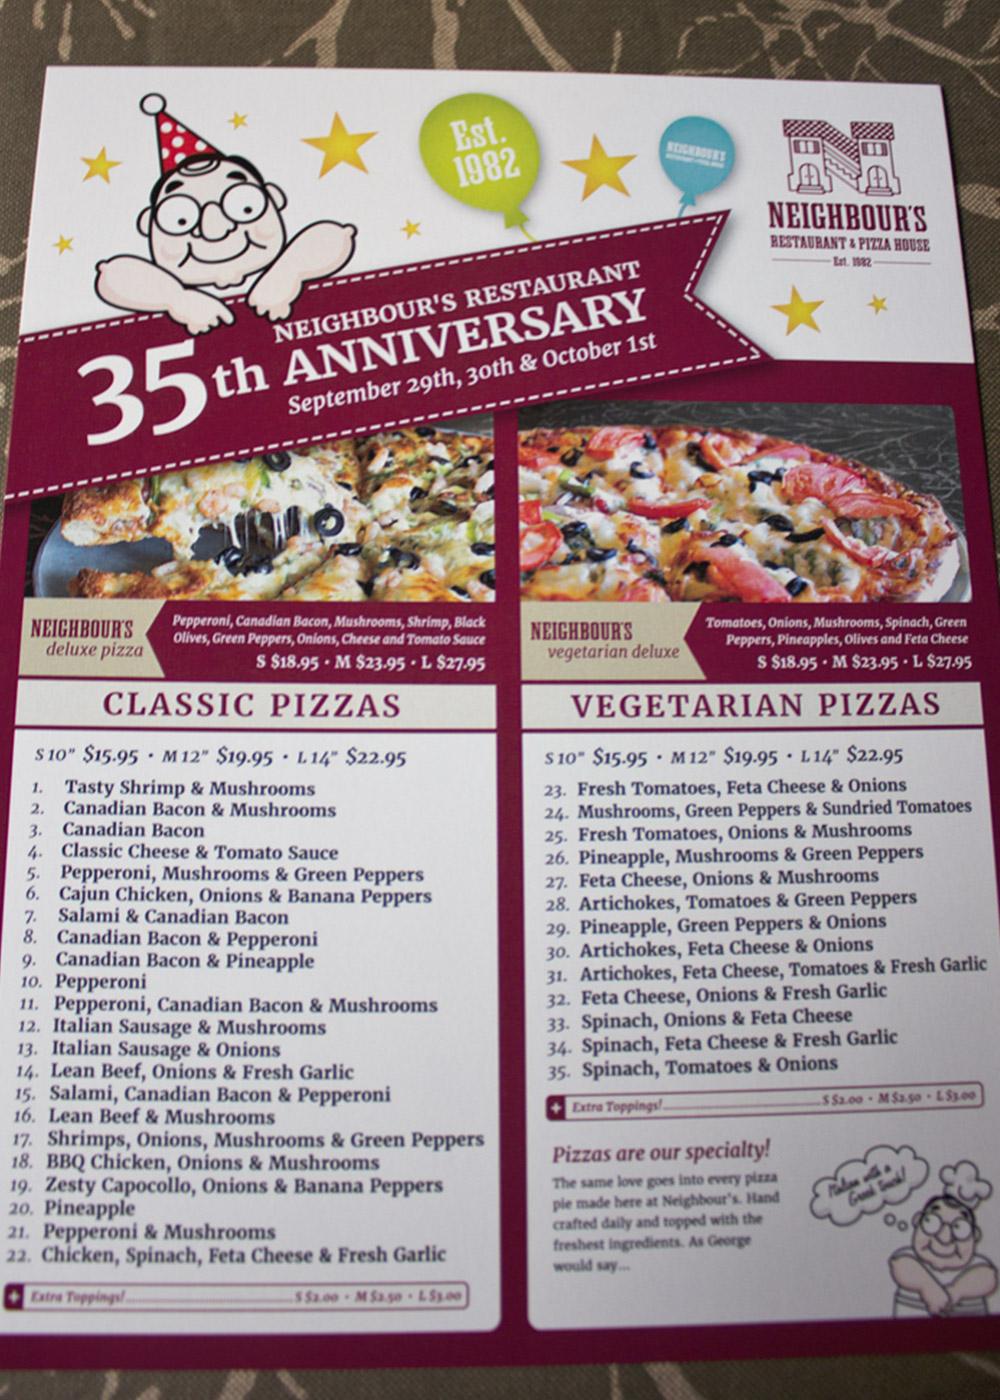 neighbours-restaurant-35th-anniversary-25.jpg